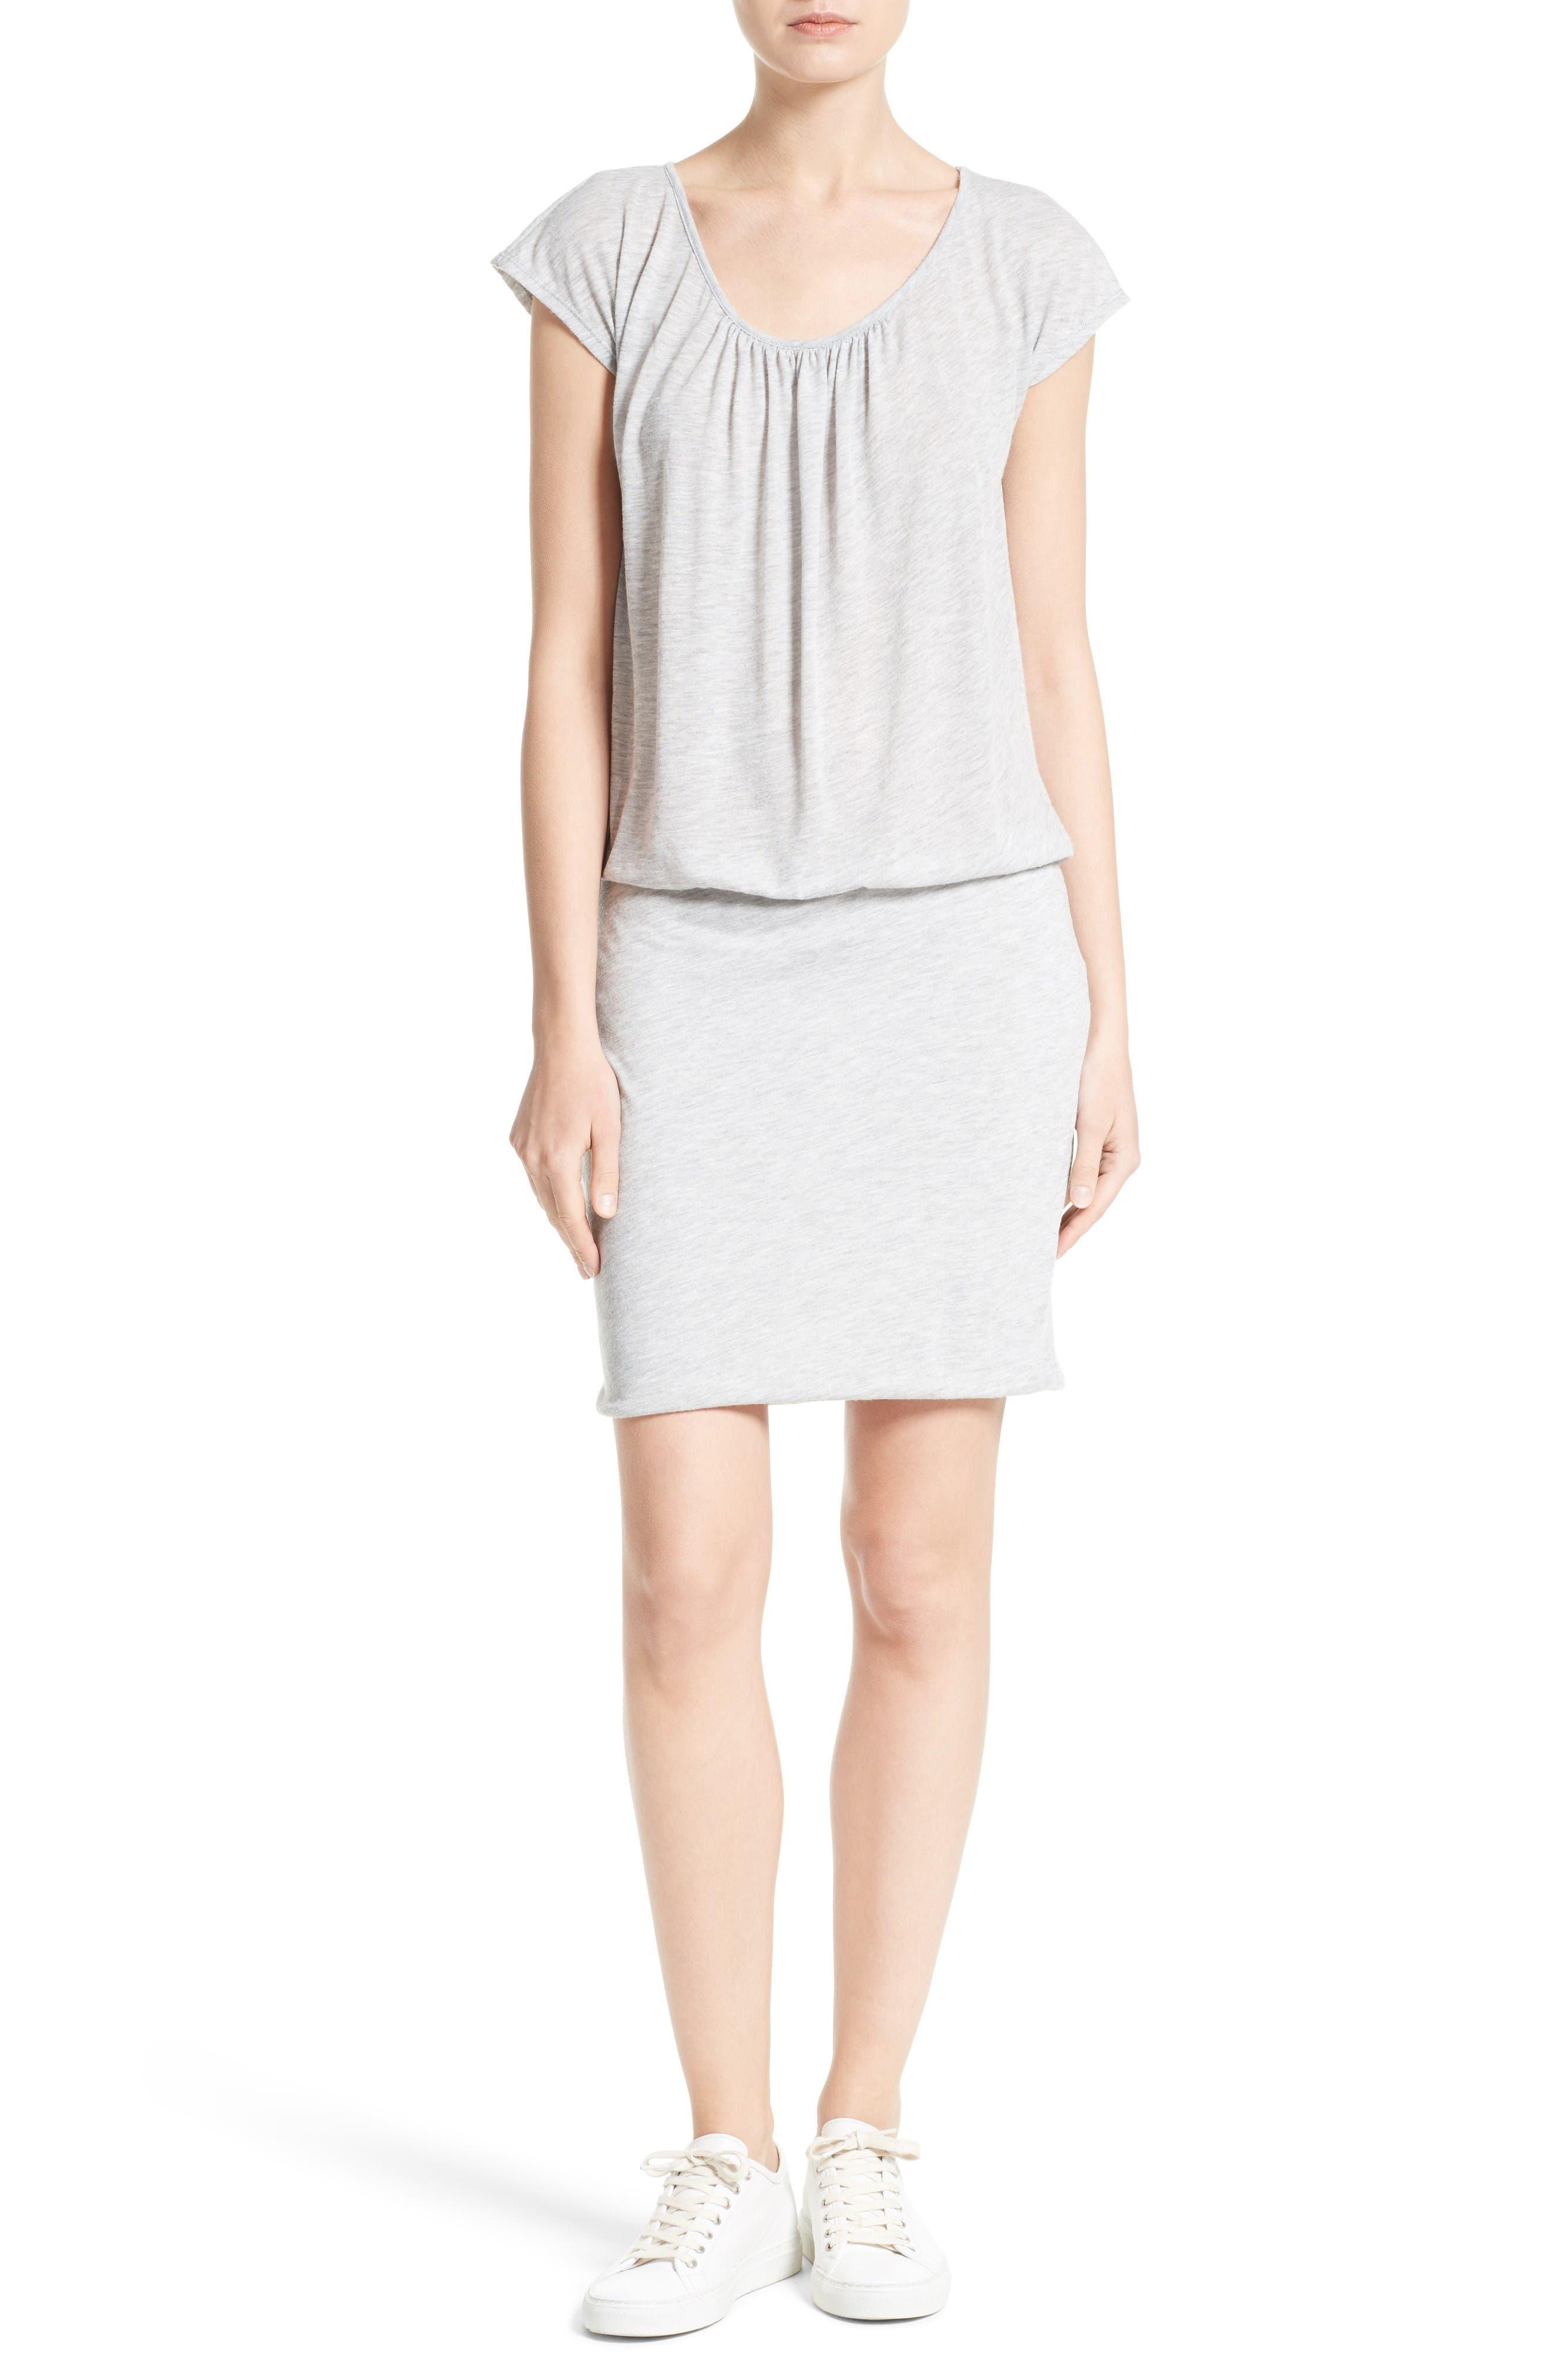 Alternate Image 1 Selected - Soft Joie Adrijana Jersey Dress